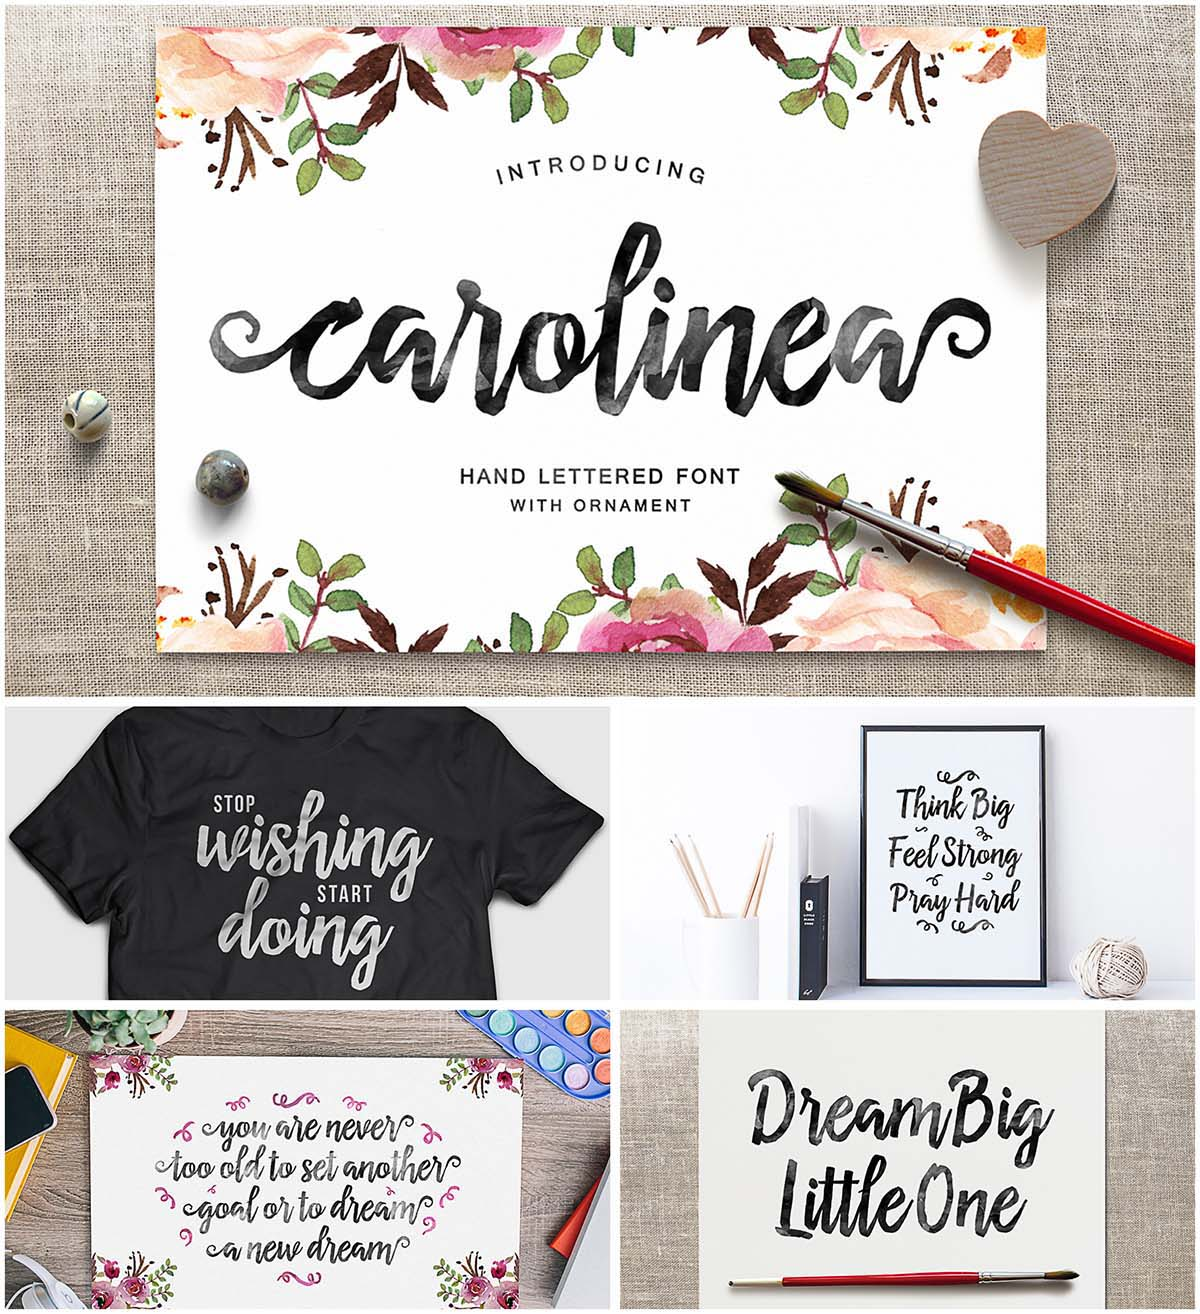 Carolinea hand drawn typeface